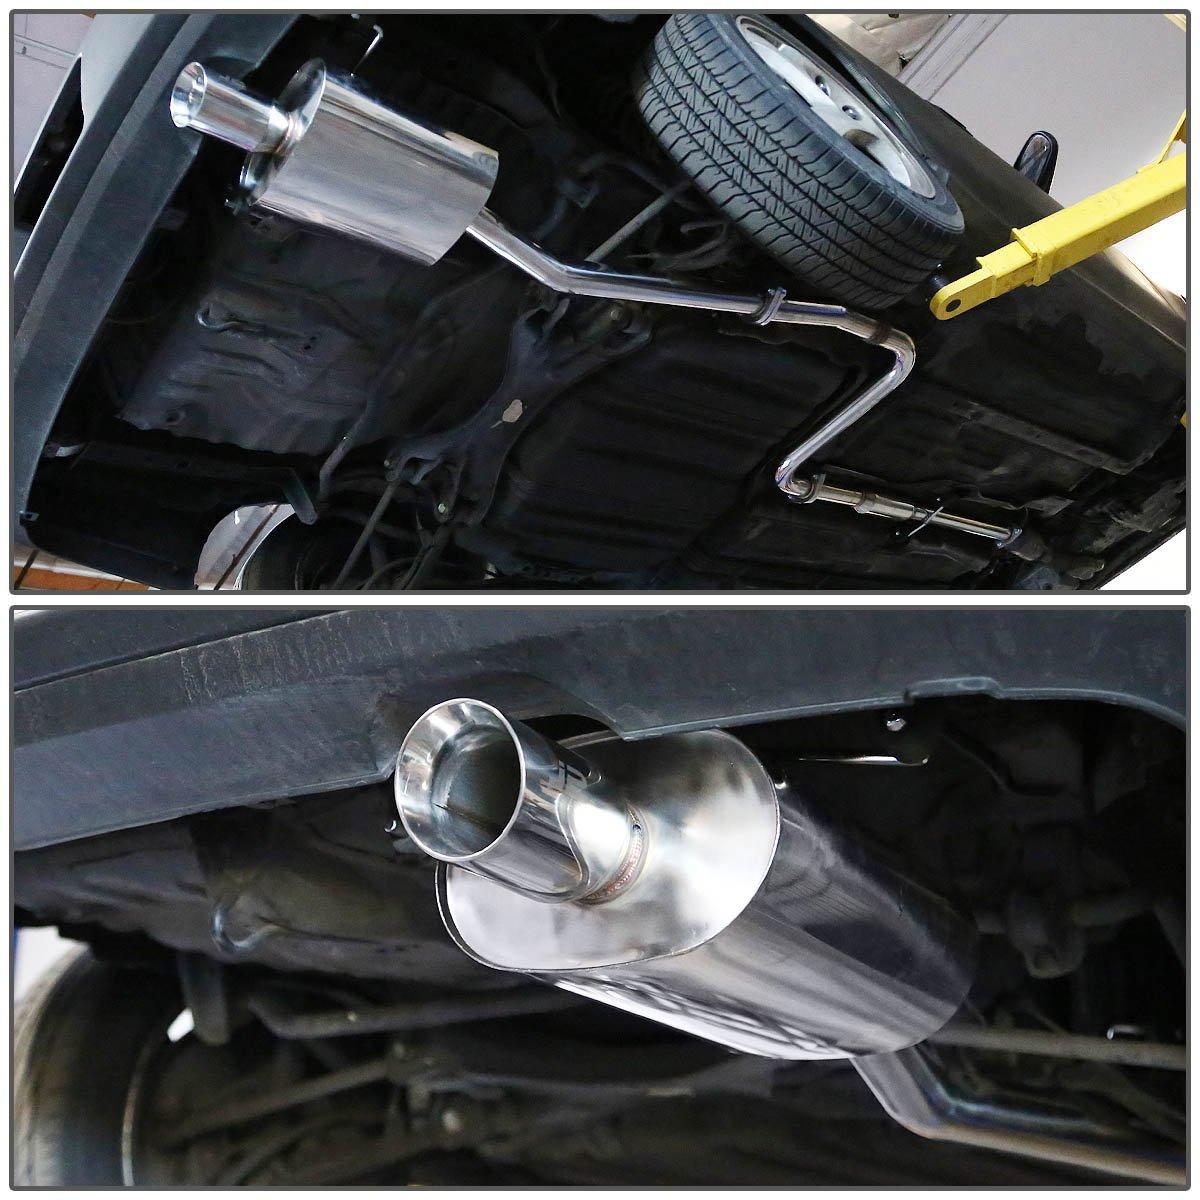 DNA Motoring J2 Engineering J2-CBE-OS-054 Catback Exhaust System